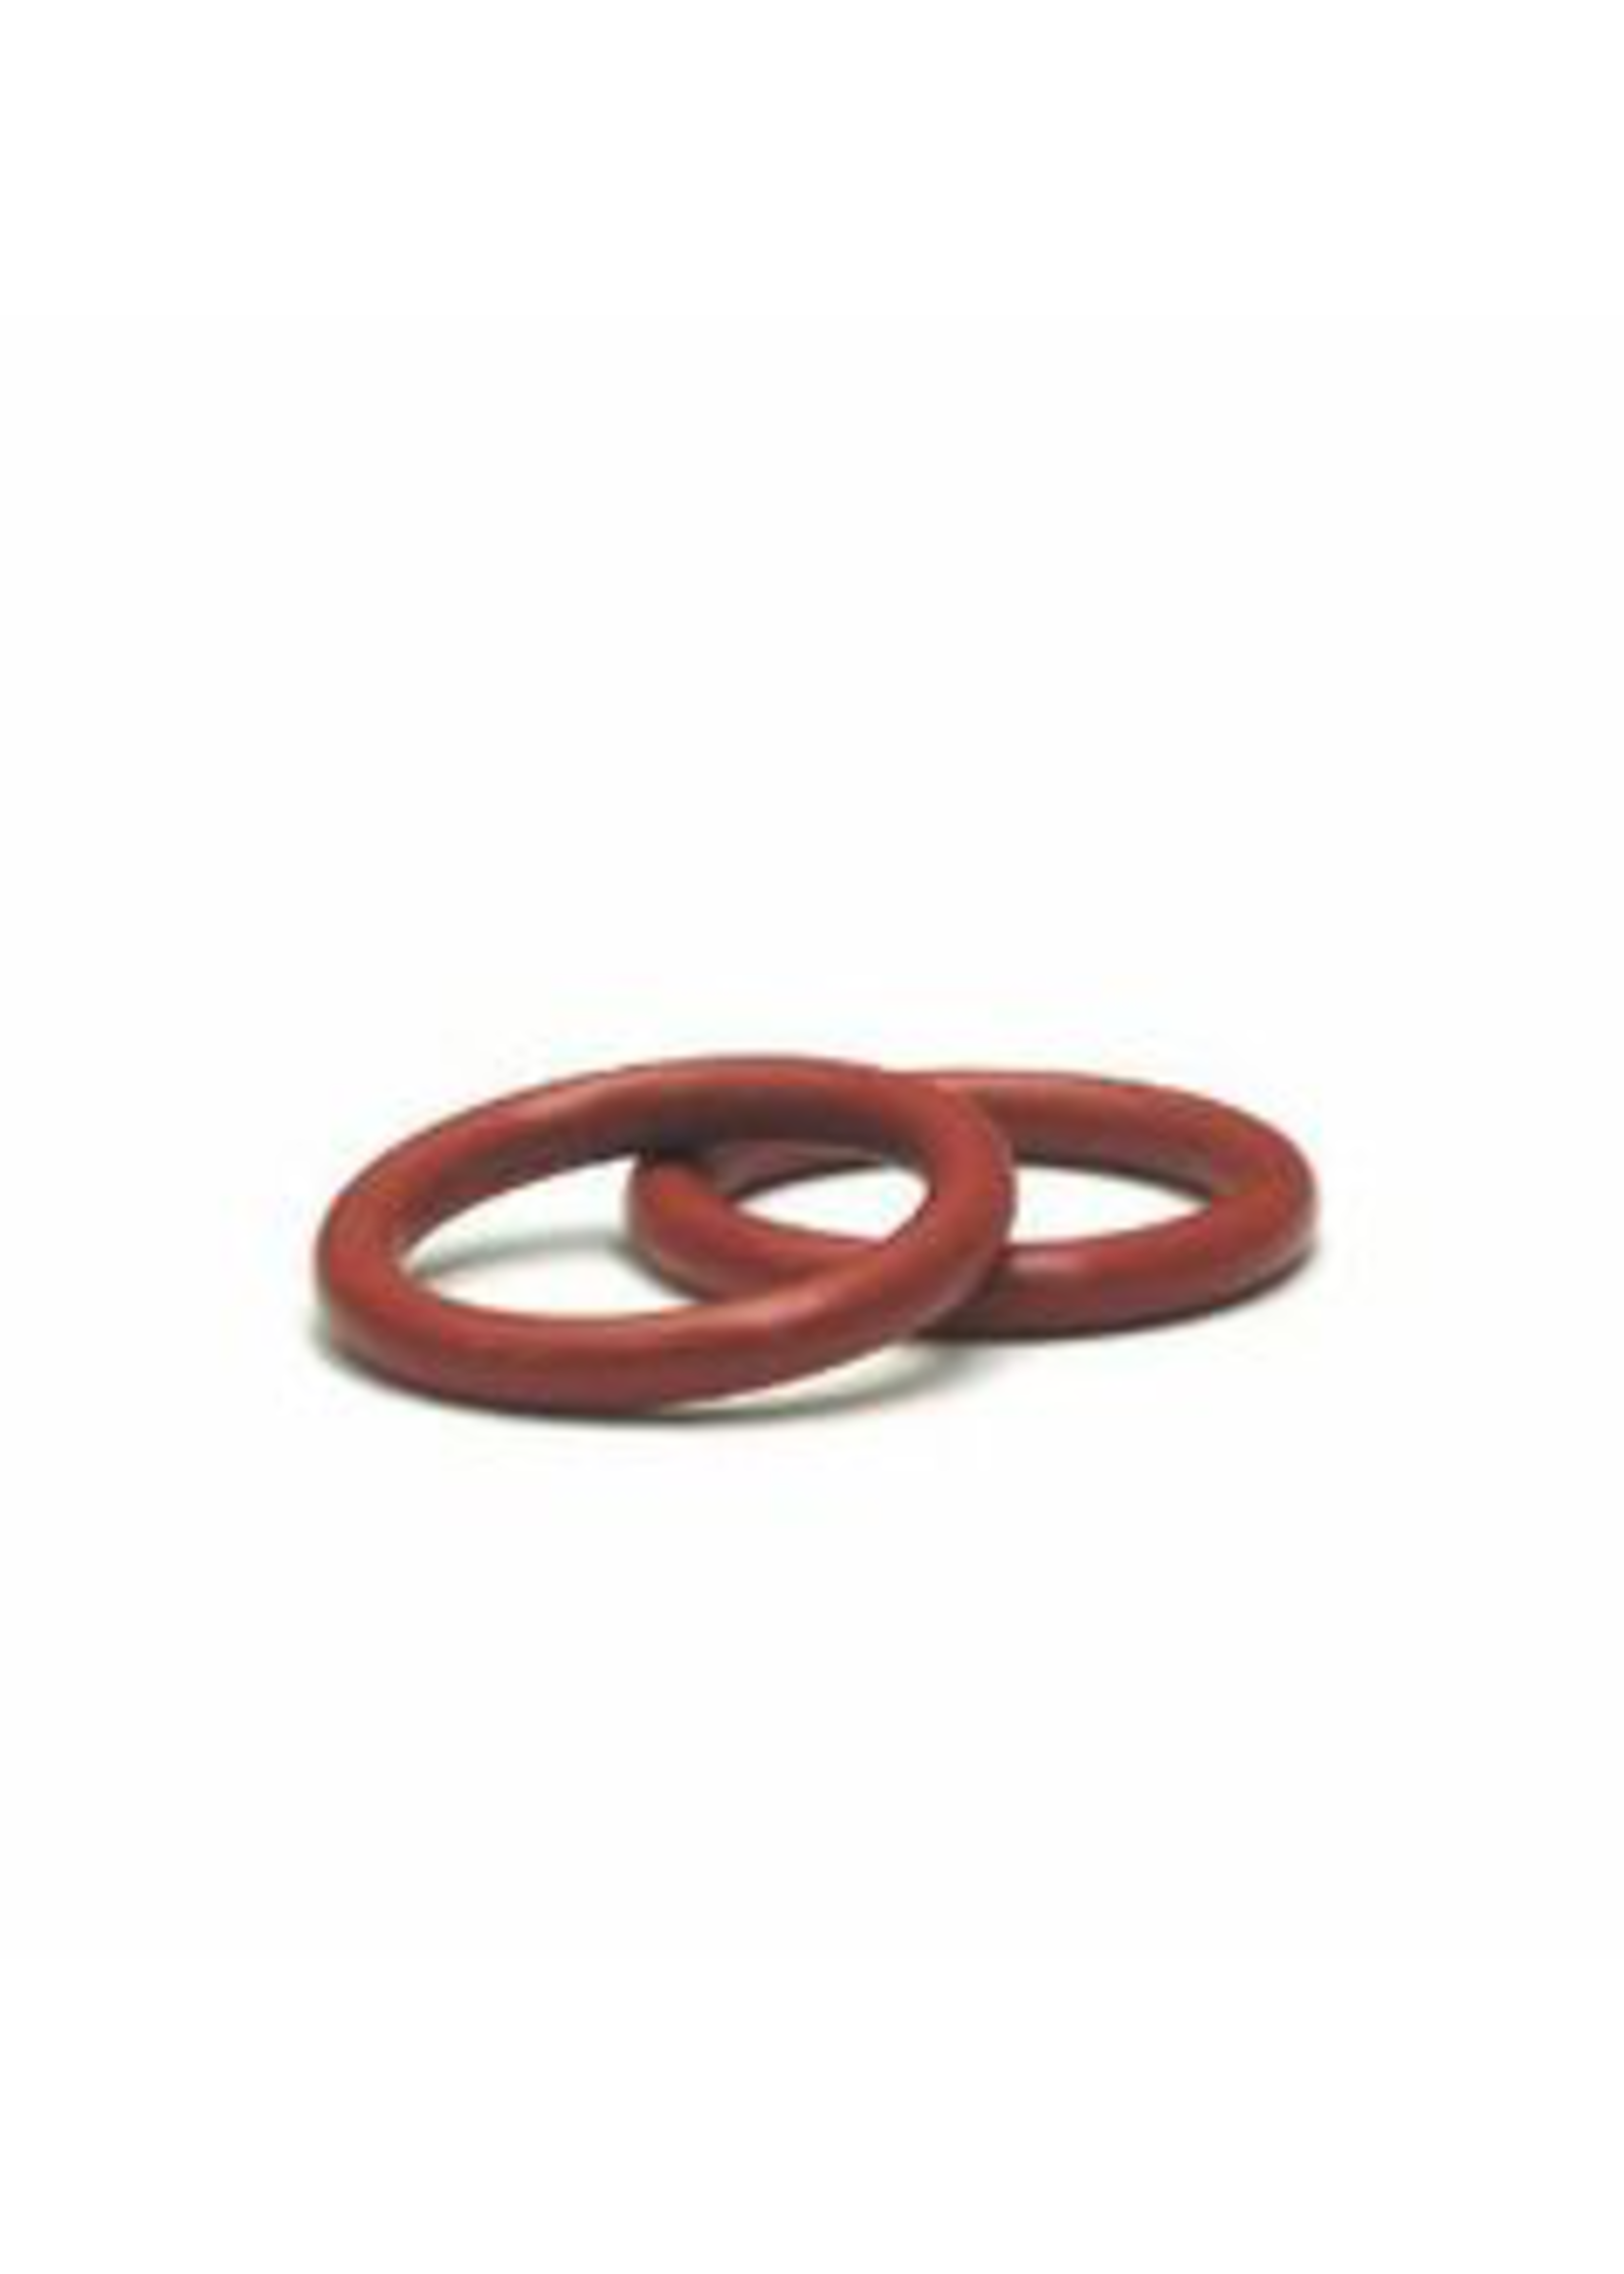 Blichmann Blichmann BoilerMaker - Valve and Dip-Tube O-Ring Replacement Kit (G2 ONLY)